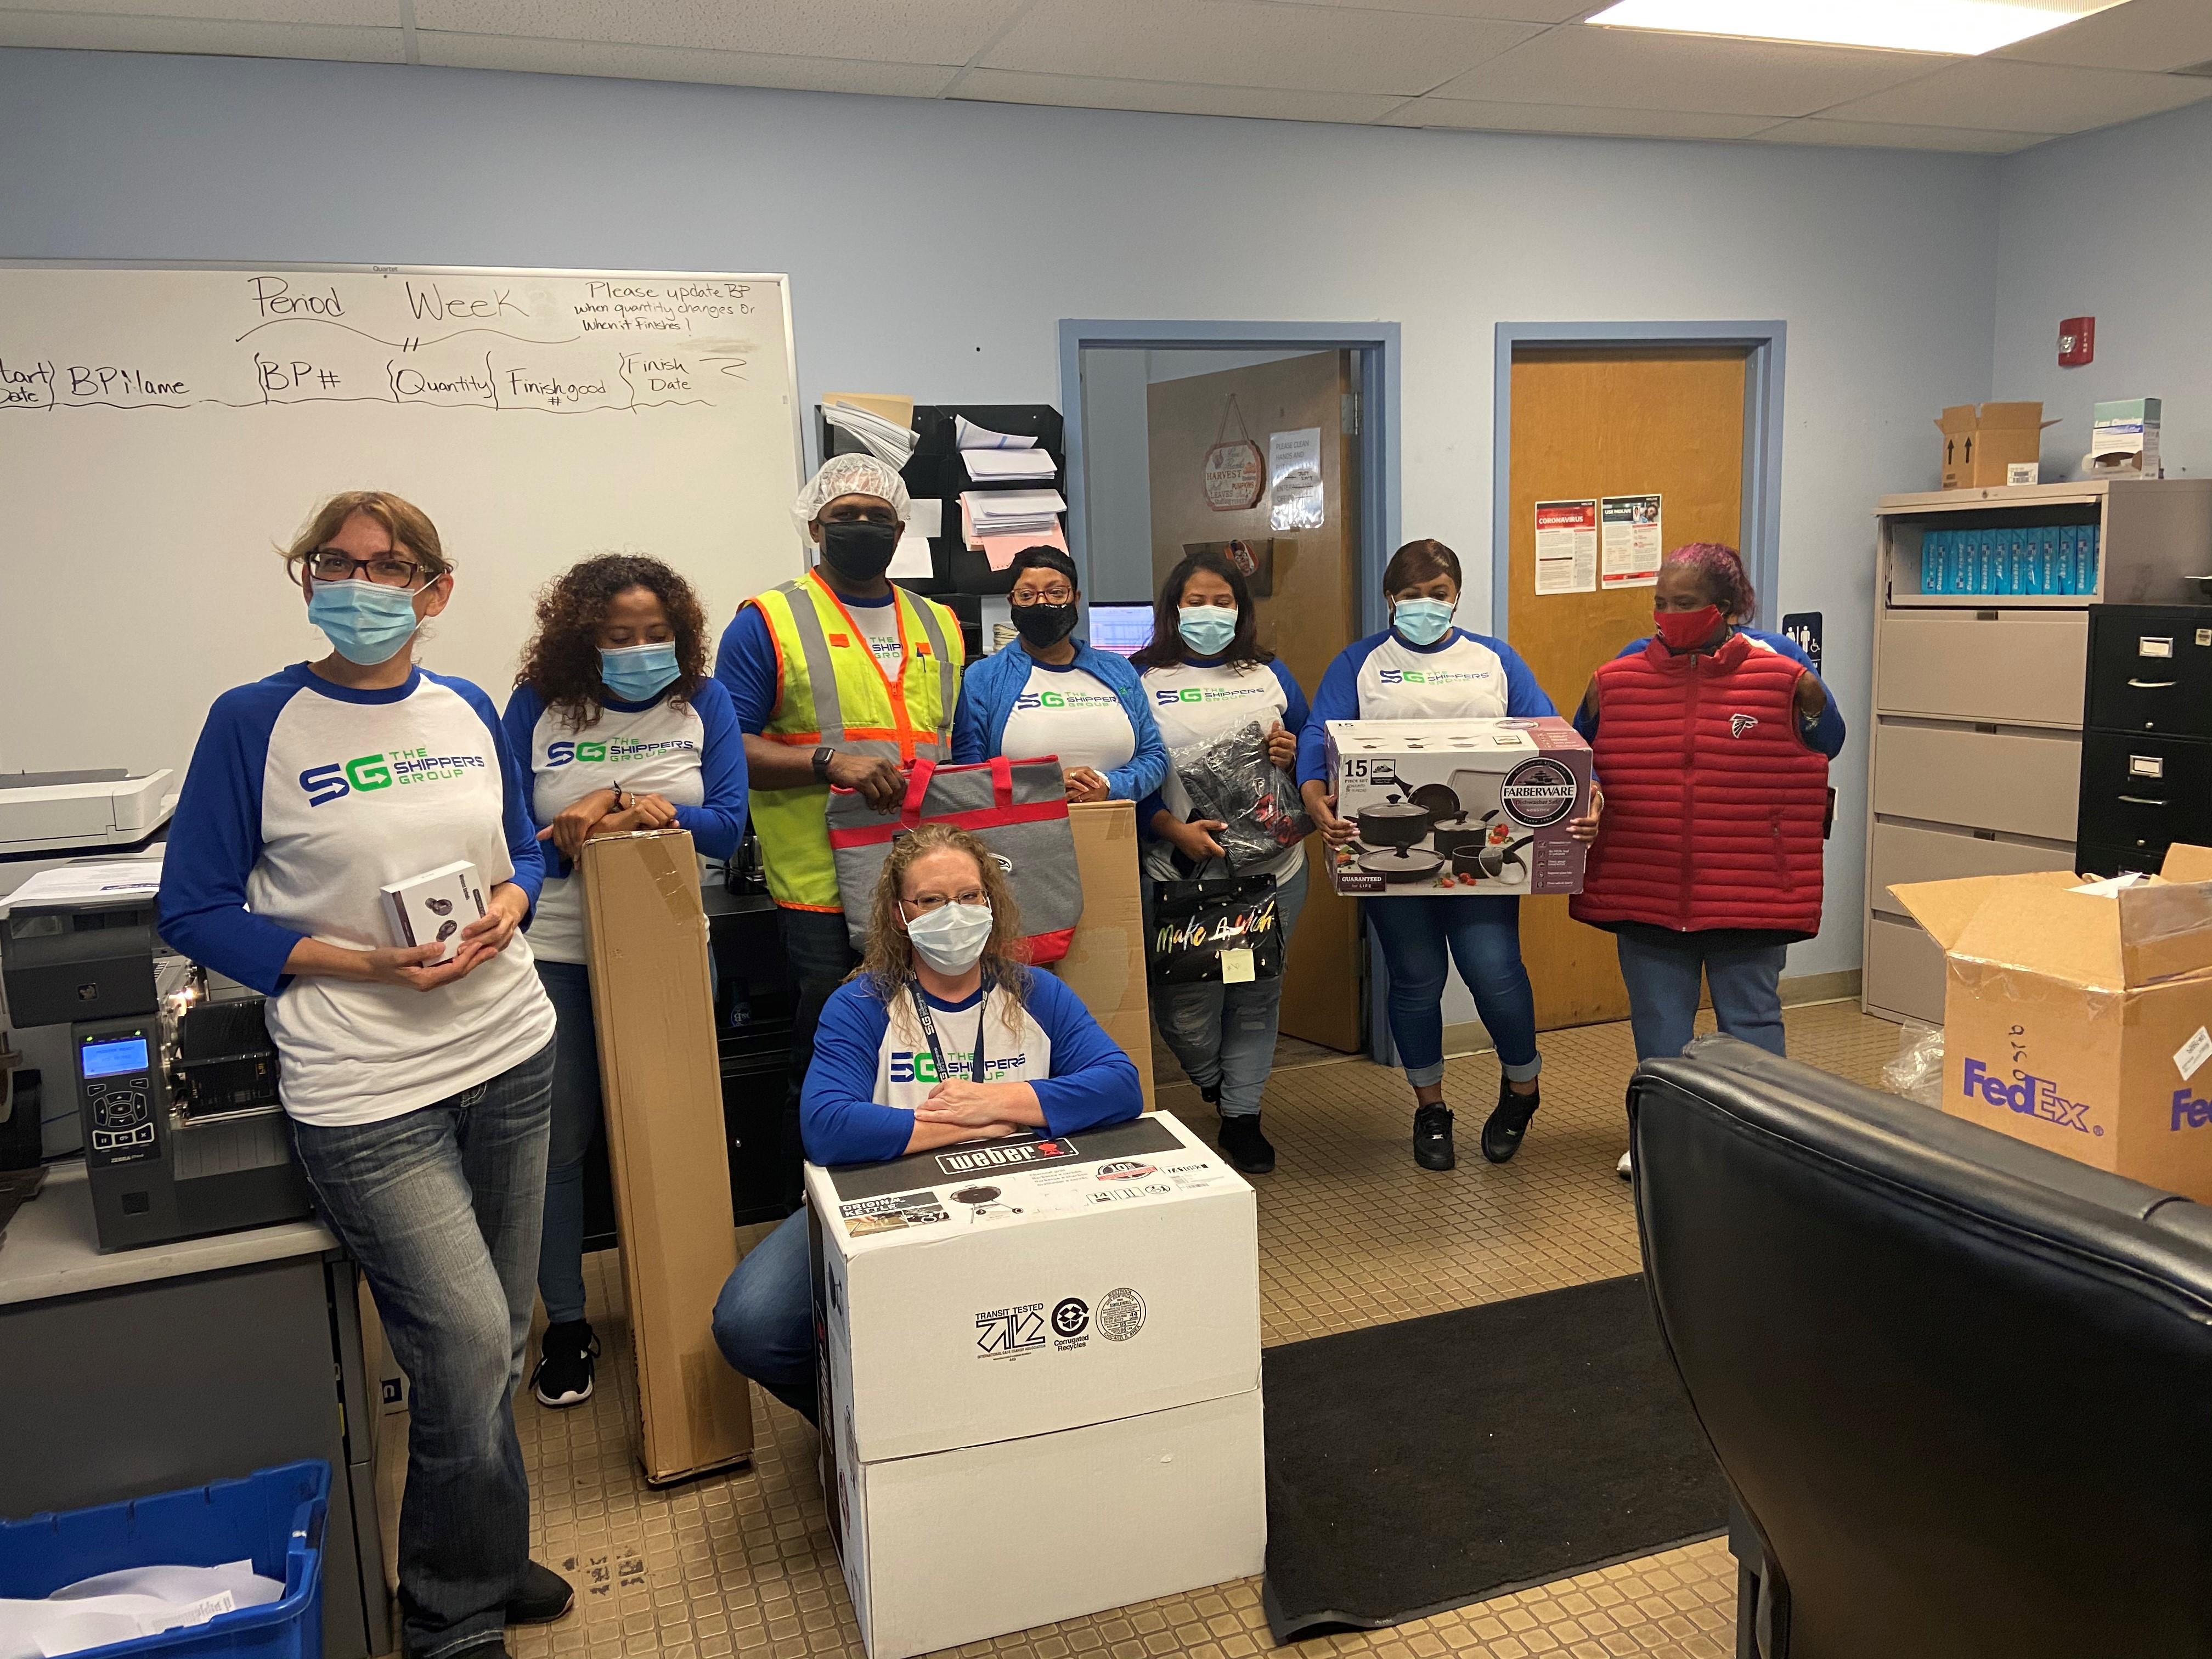 Jonesboro associates raffled prizes and played team-building games